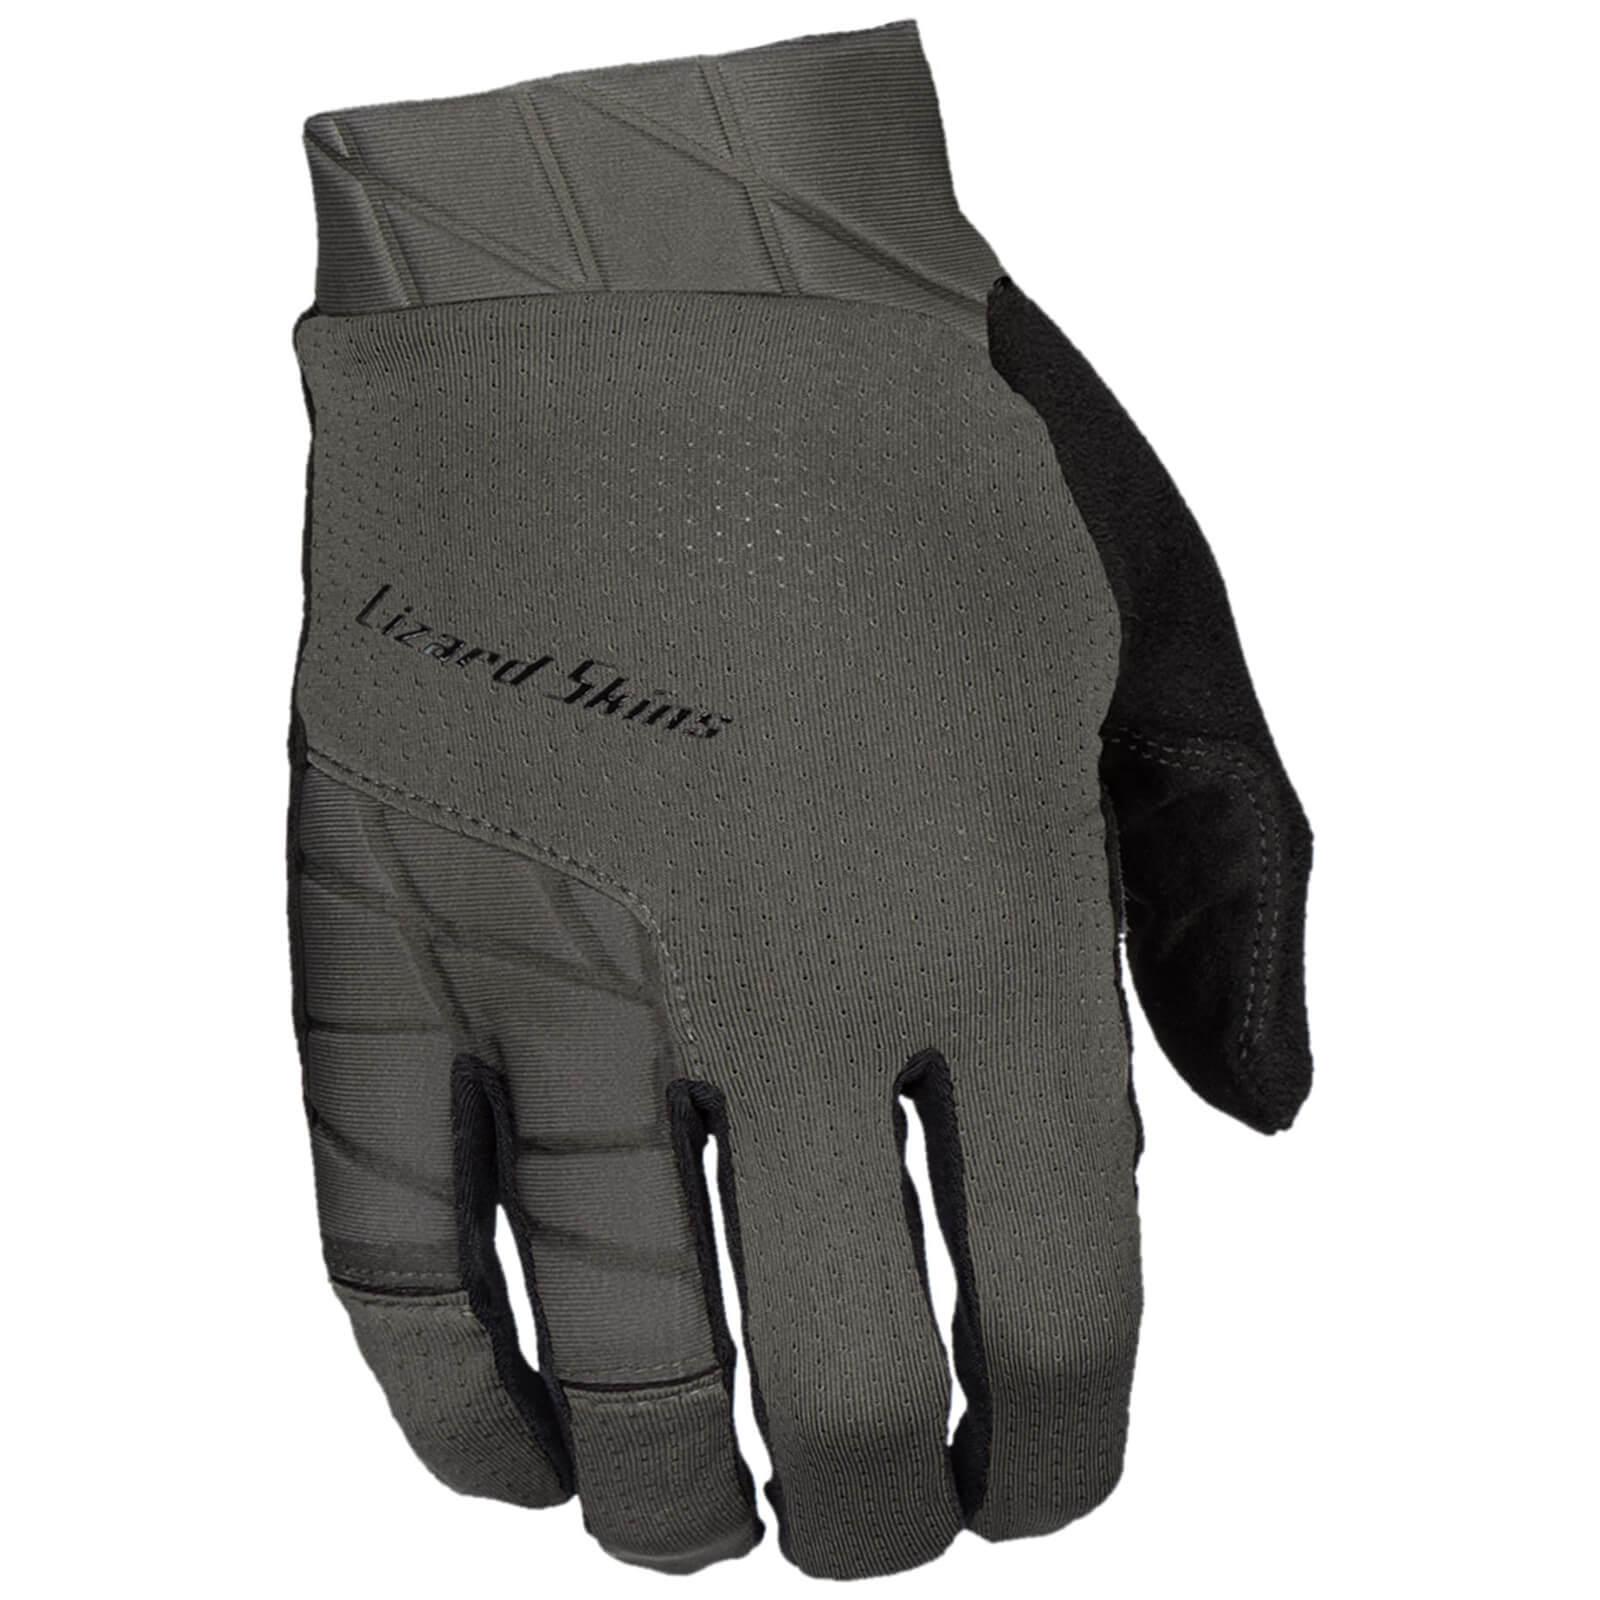 Lizard Skins Monitor Ops Gloves - M - Graphite Grey